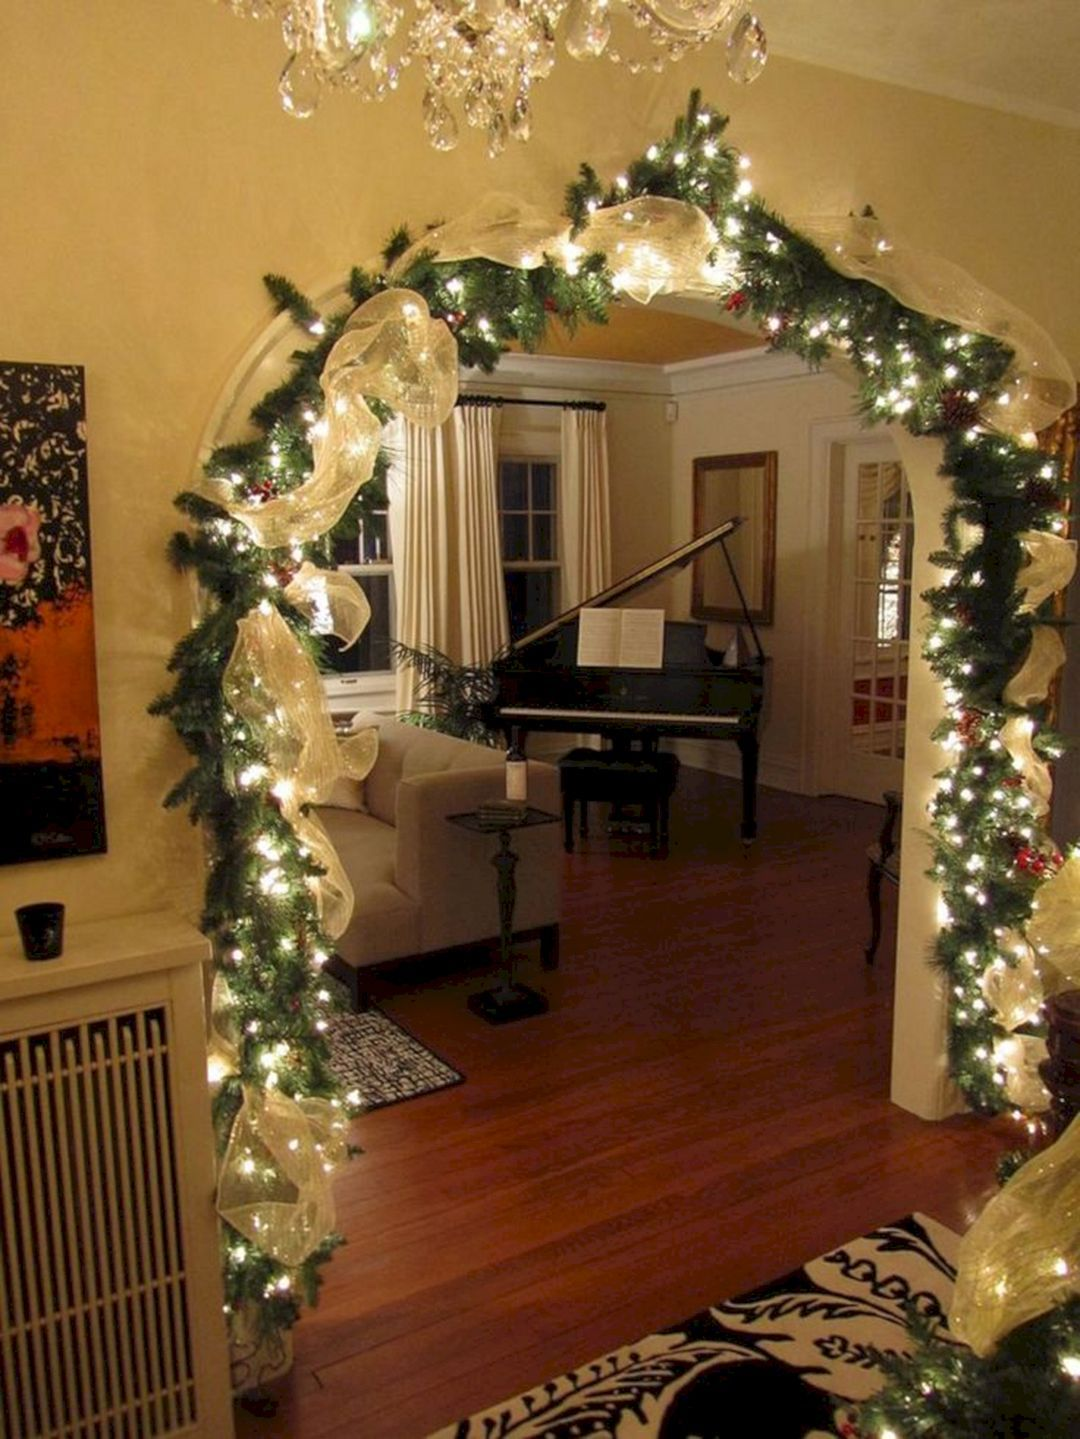 Sublime 20 Marvelous Indoor Christmas Decorations Ideas That Make Your Happy Https Decoredo Com 2371 Christmas Lights Garland Indoor Christmas Holiday Decor